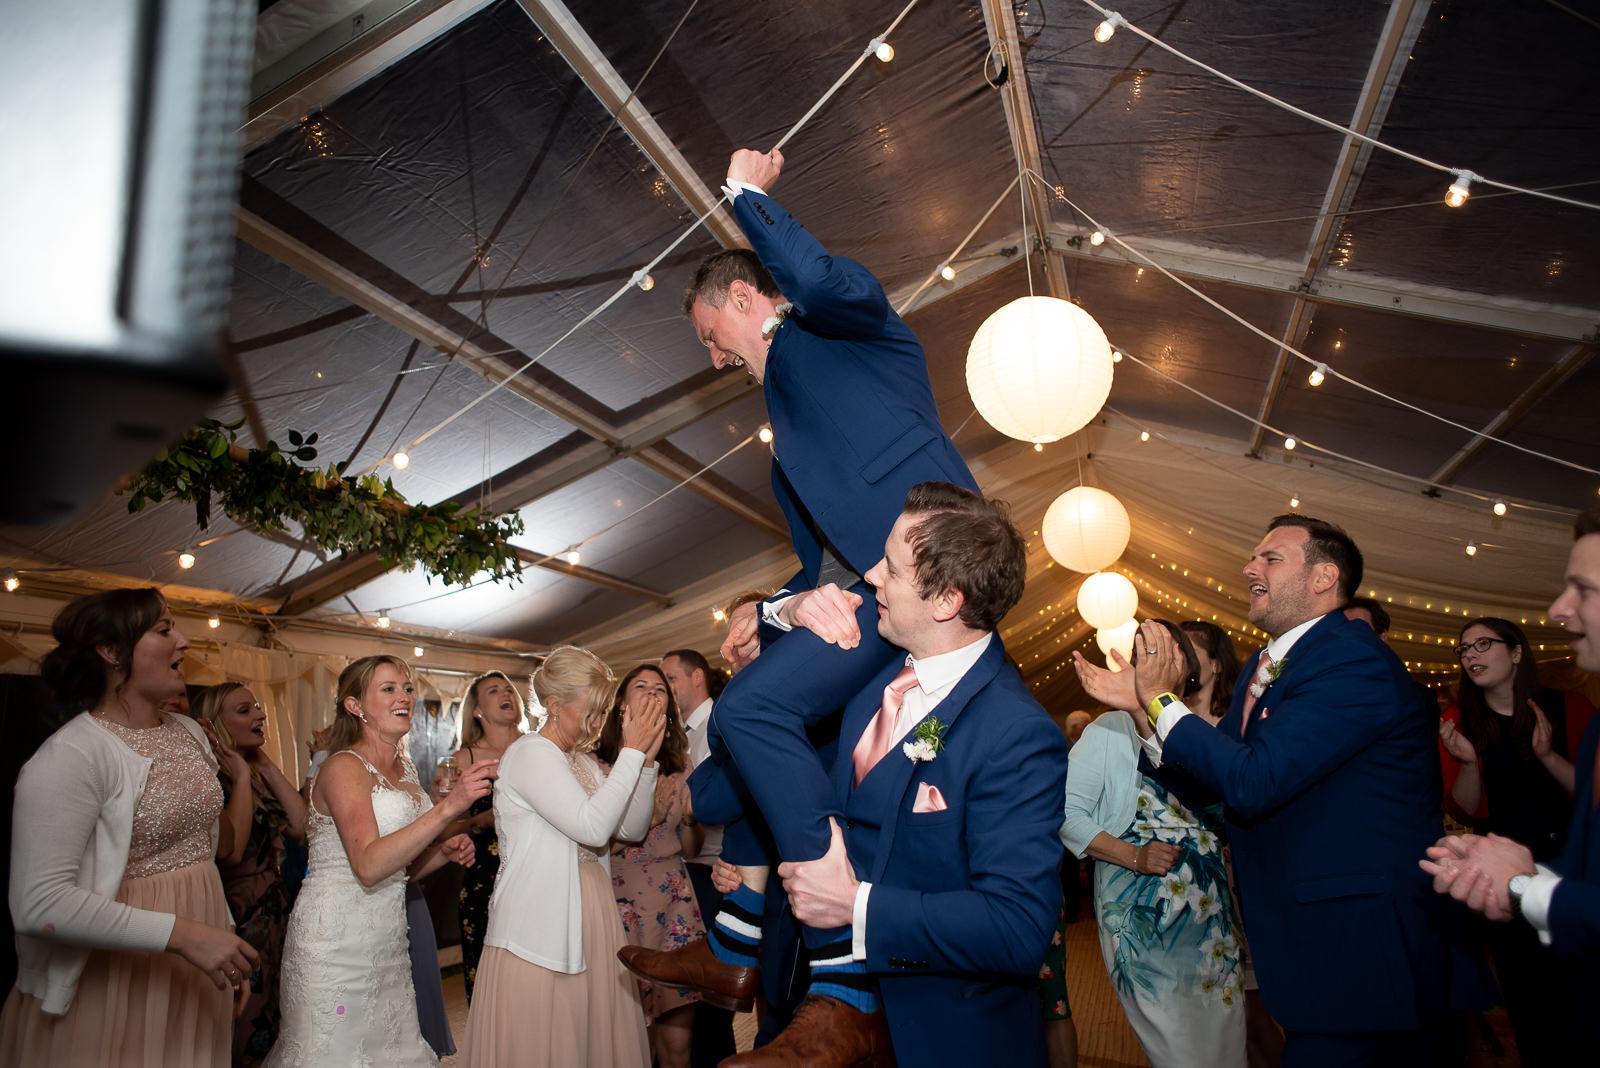 Roscarrock Farm wedding in Cornwall 090.jpg